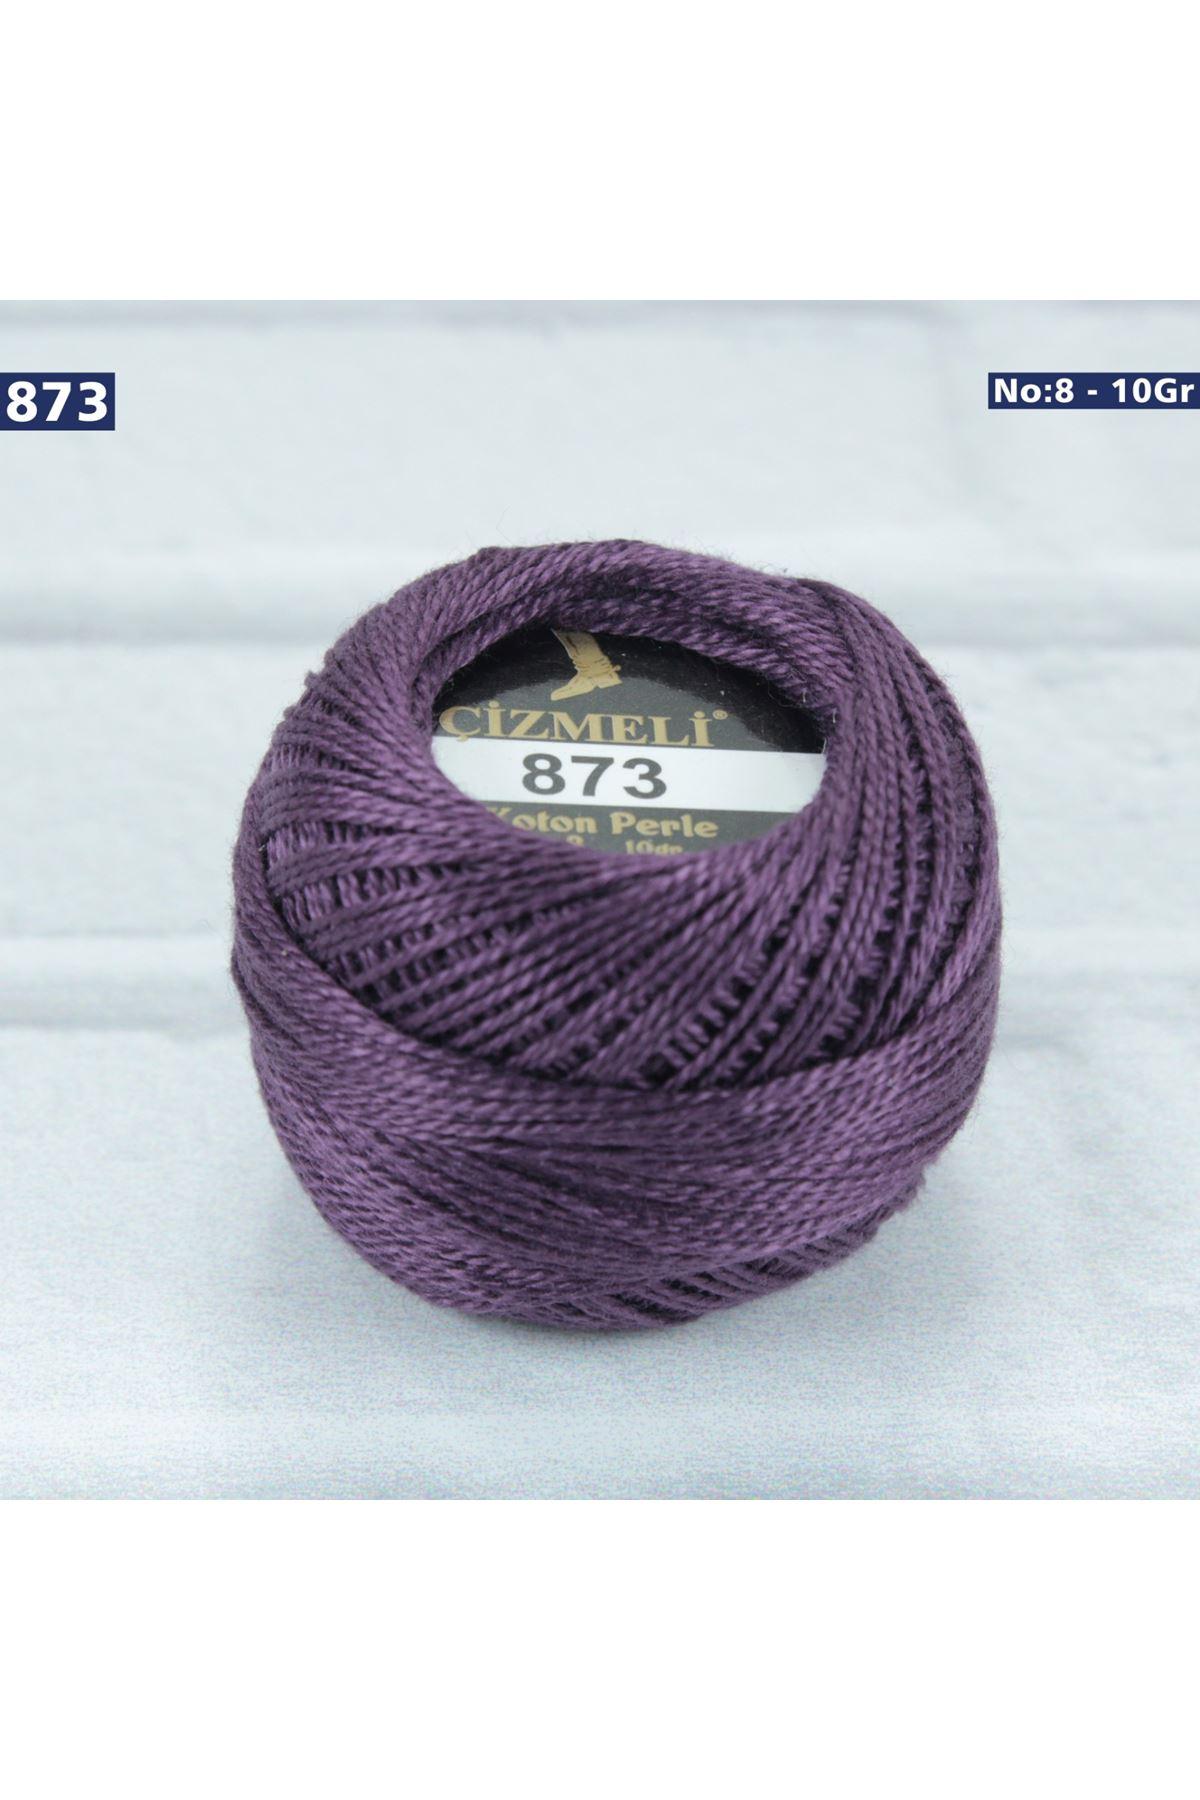 Çizmeli Cotton Perle Nakış İpliği No: 873